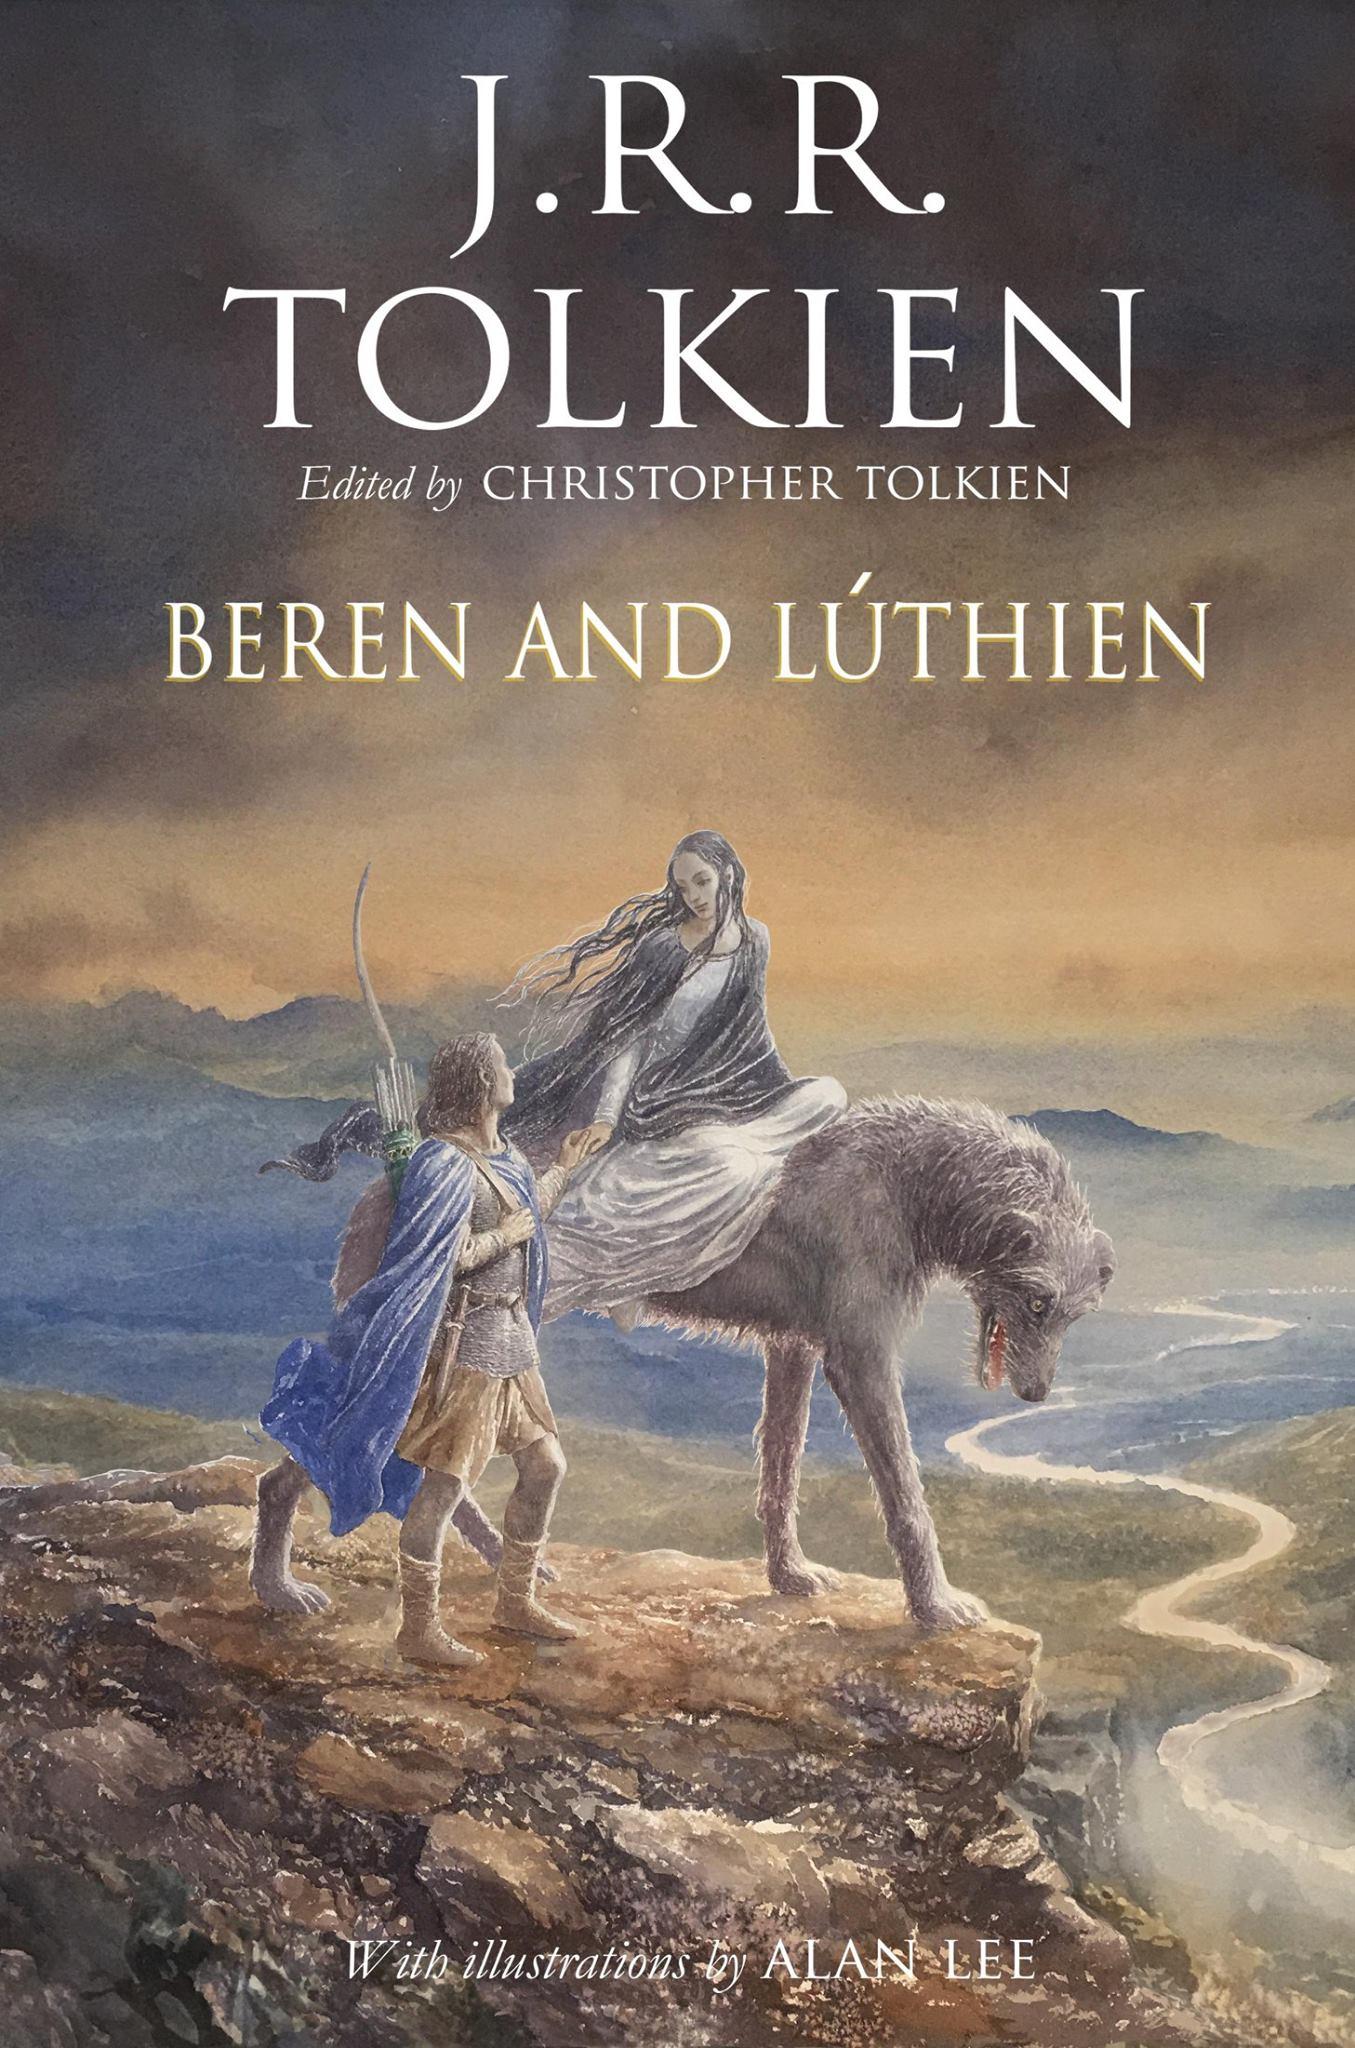 beren_and_luthien.jpg